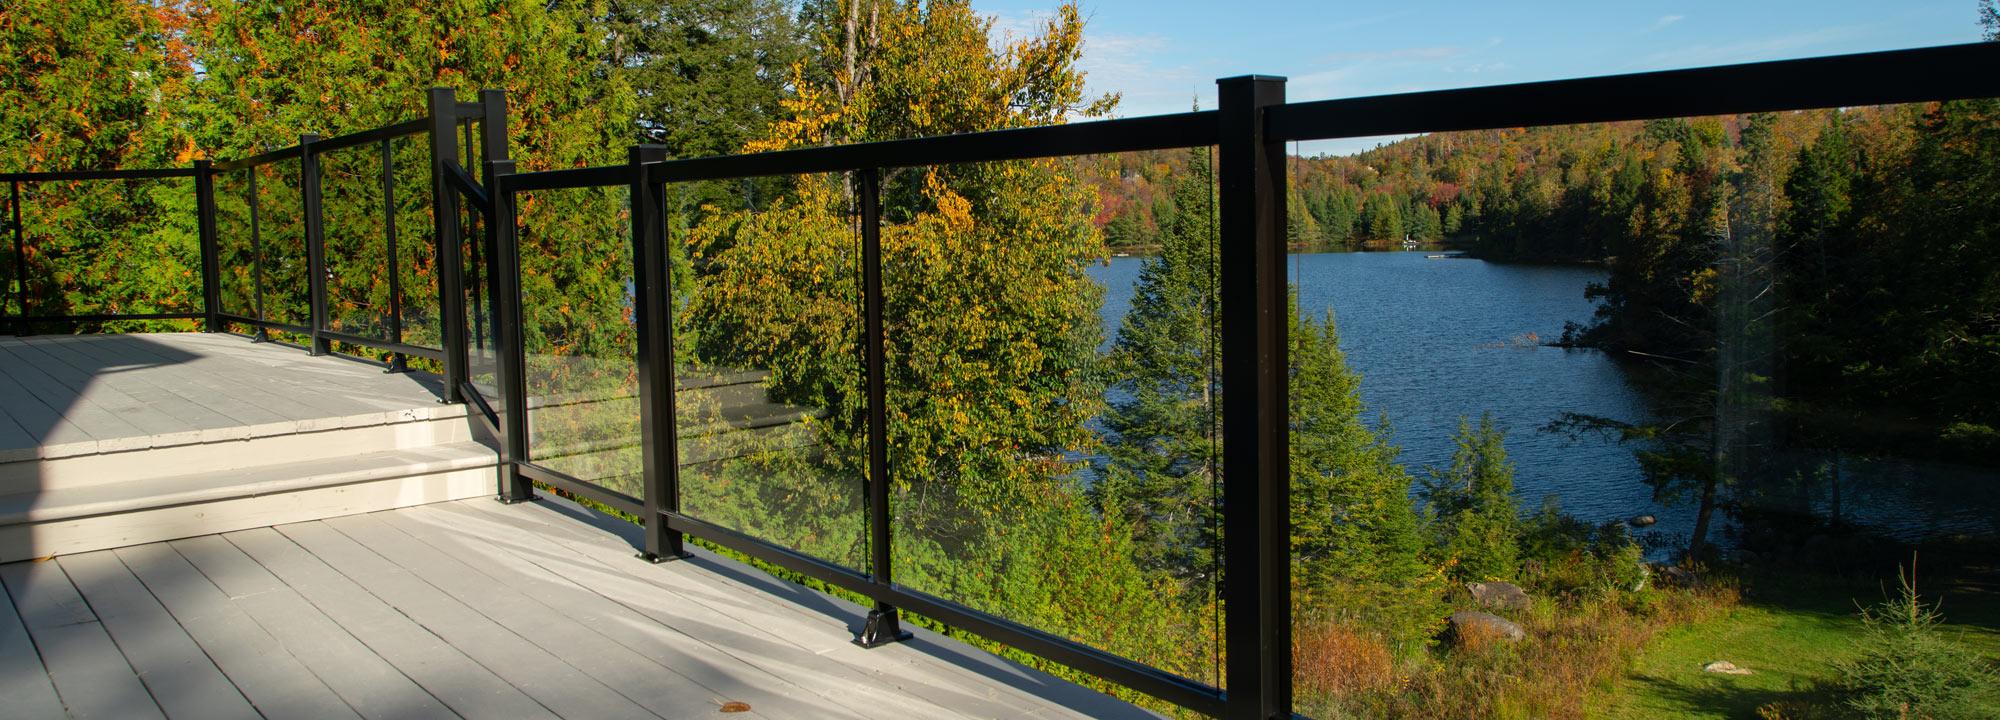 6-mm tempered glass railing 8